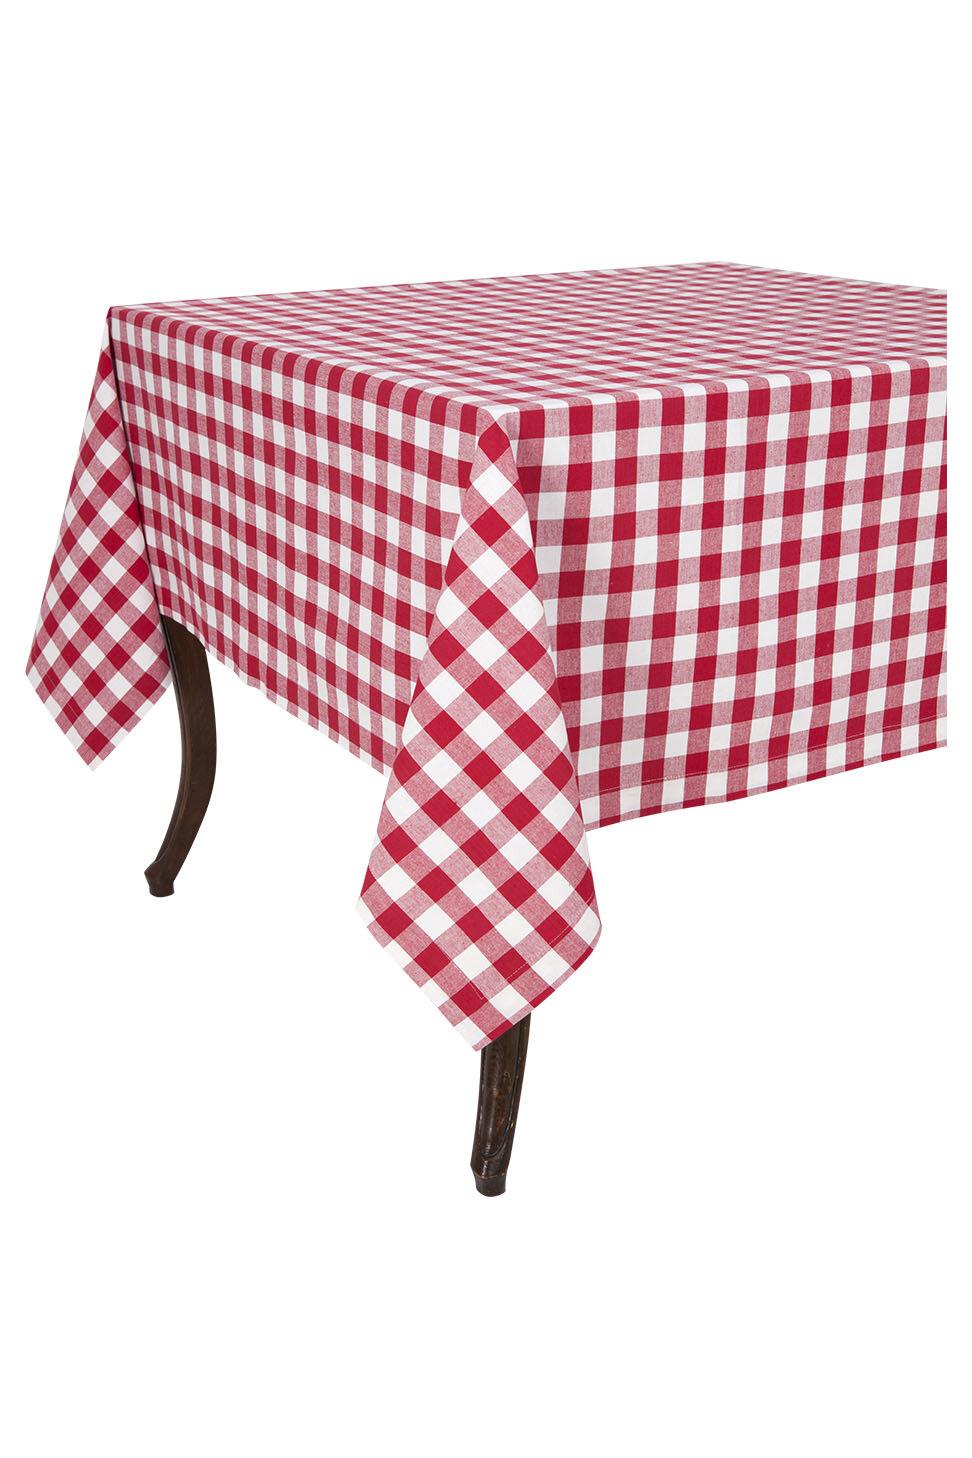 August Grove Obanion Check Tablecloth Reviews Wayfair